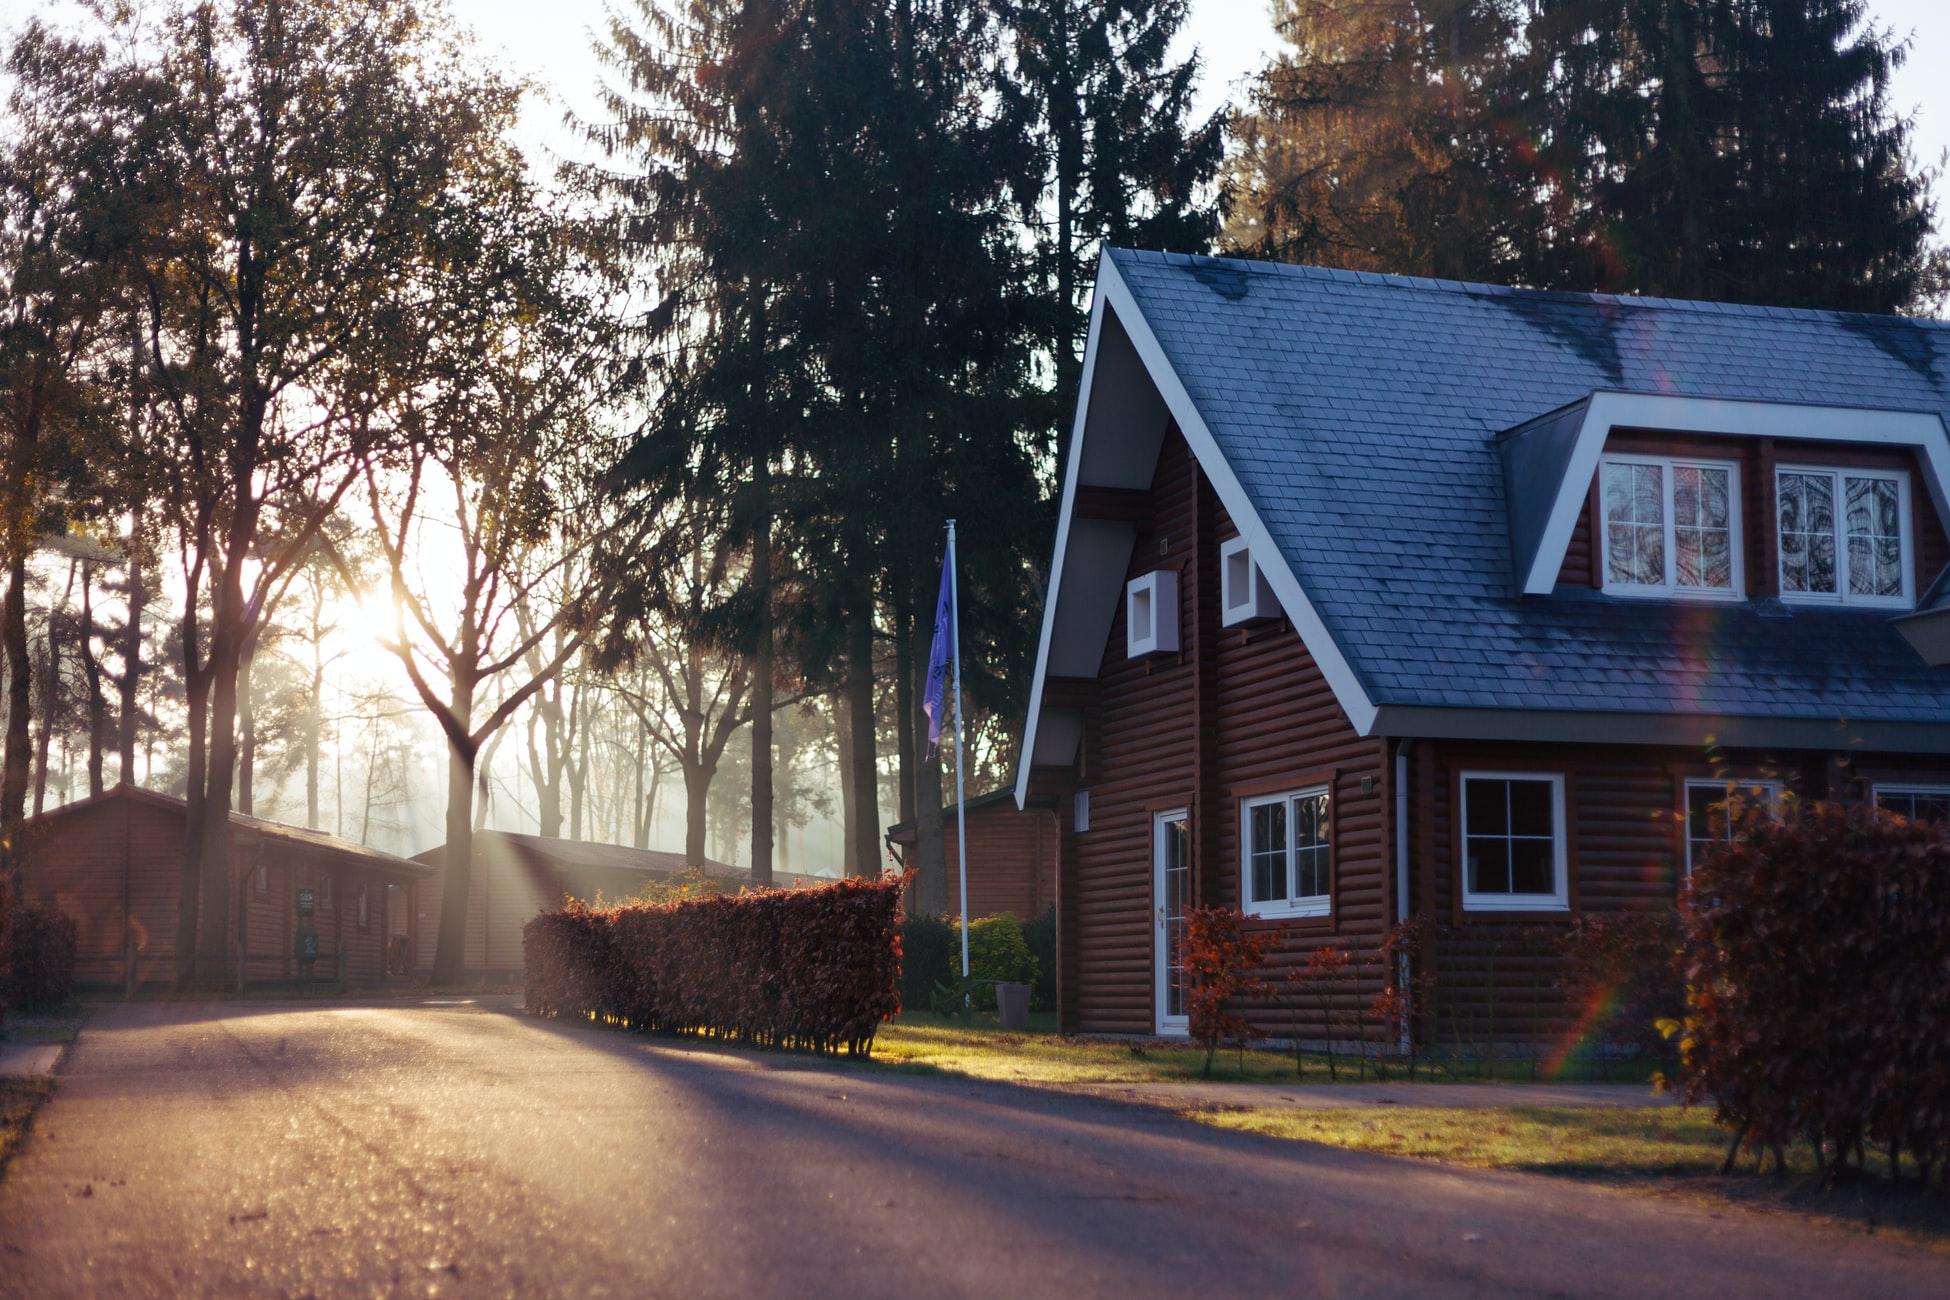 Sky Stucco Systems Home Maintenance Checklist for Winter